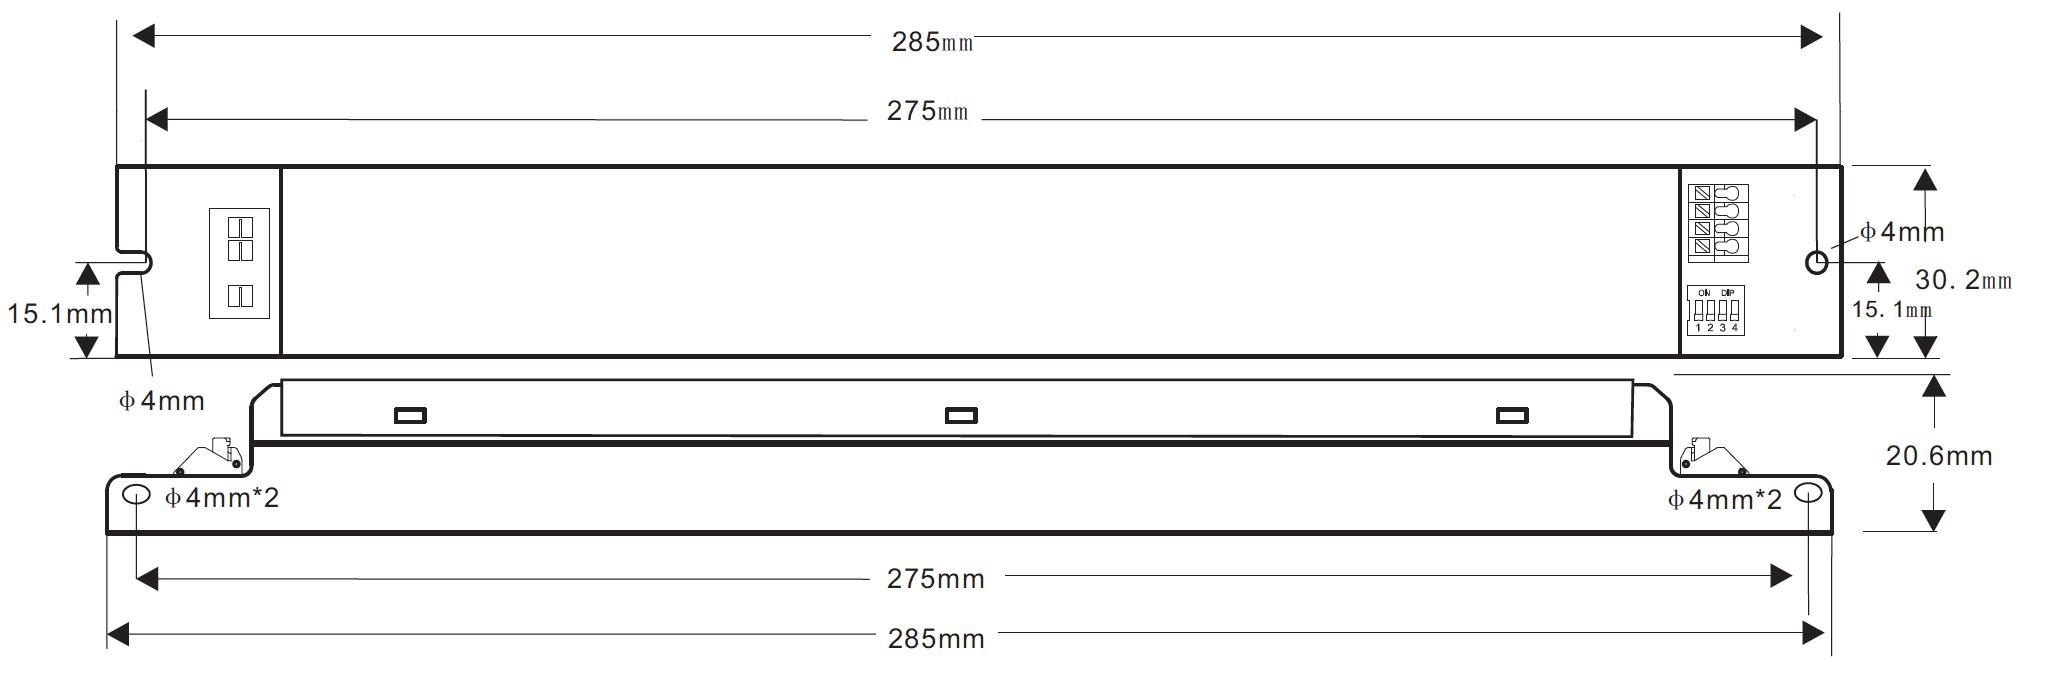 BK-BHL050-1250AD LED Driver Constant Current dimensions